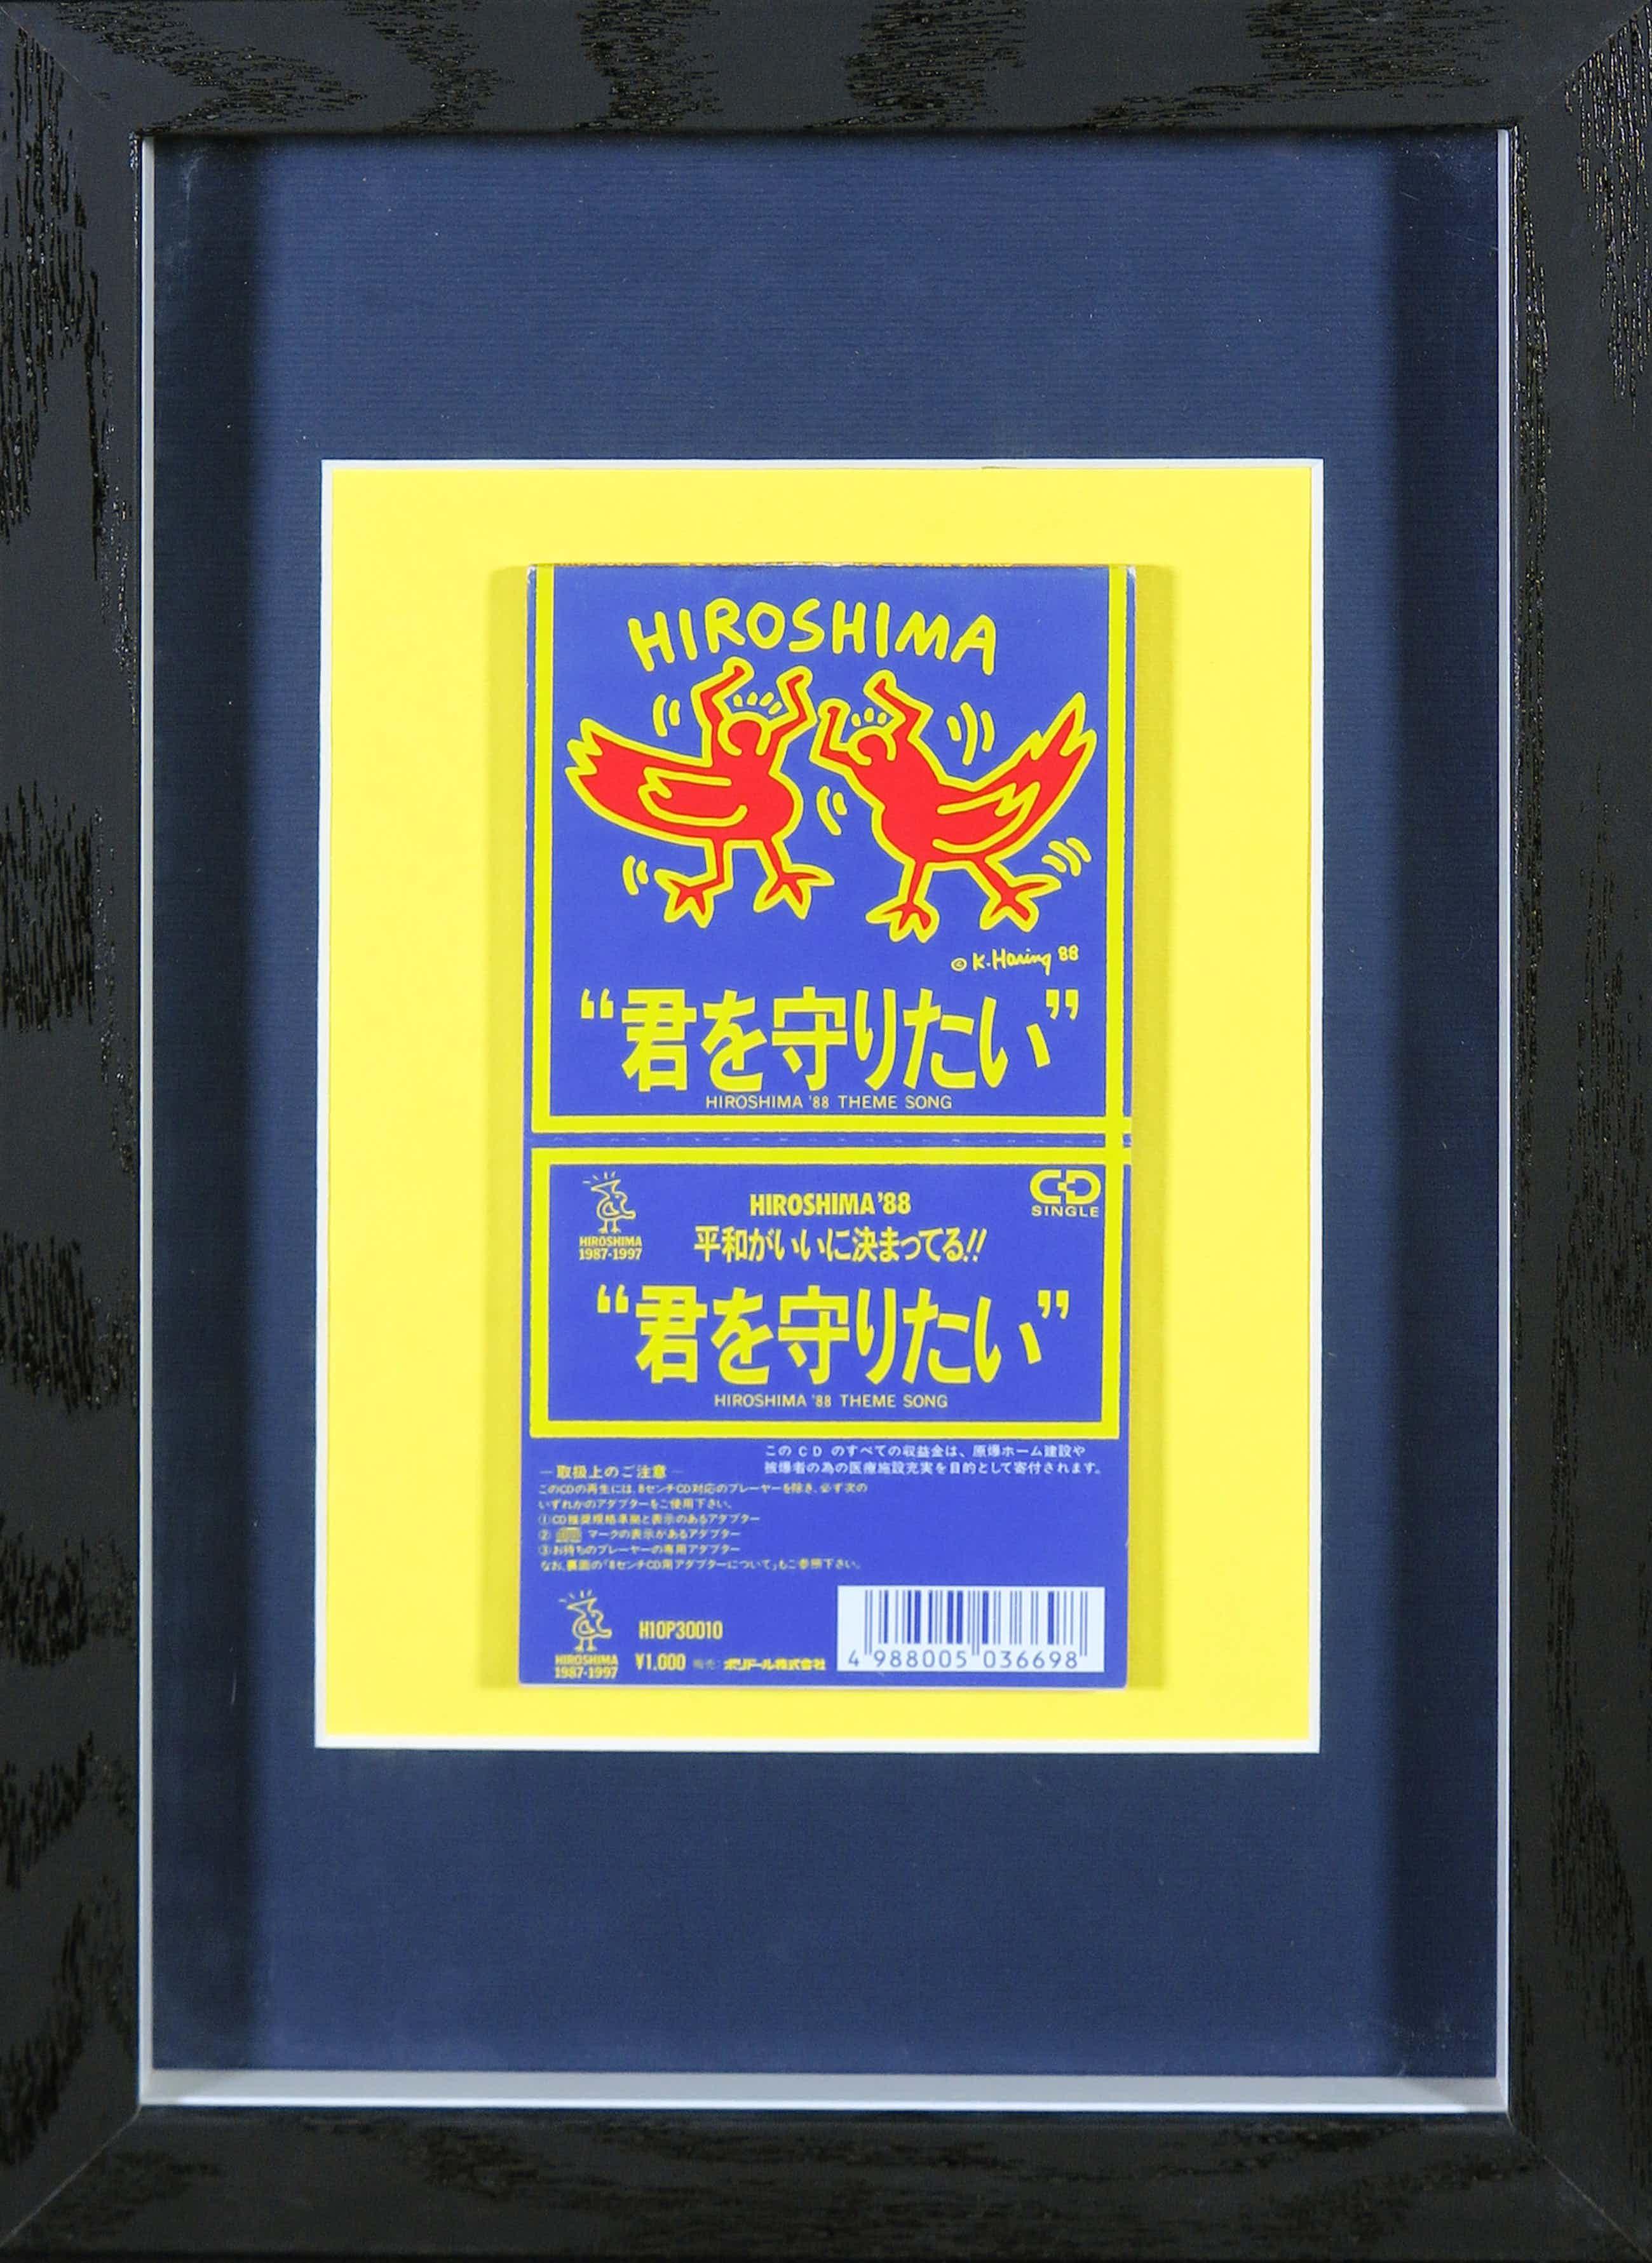 Keith Haring - CD Single - Peace Birds '88 All Stars – 君を守りたい kopen? Bied vanaf 46!